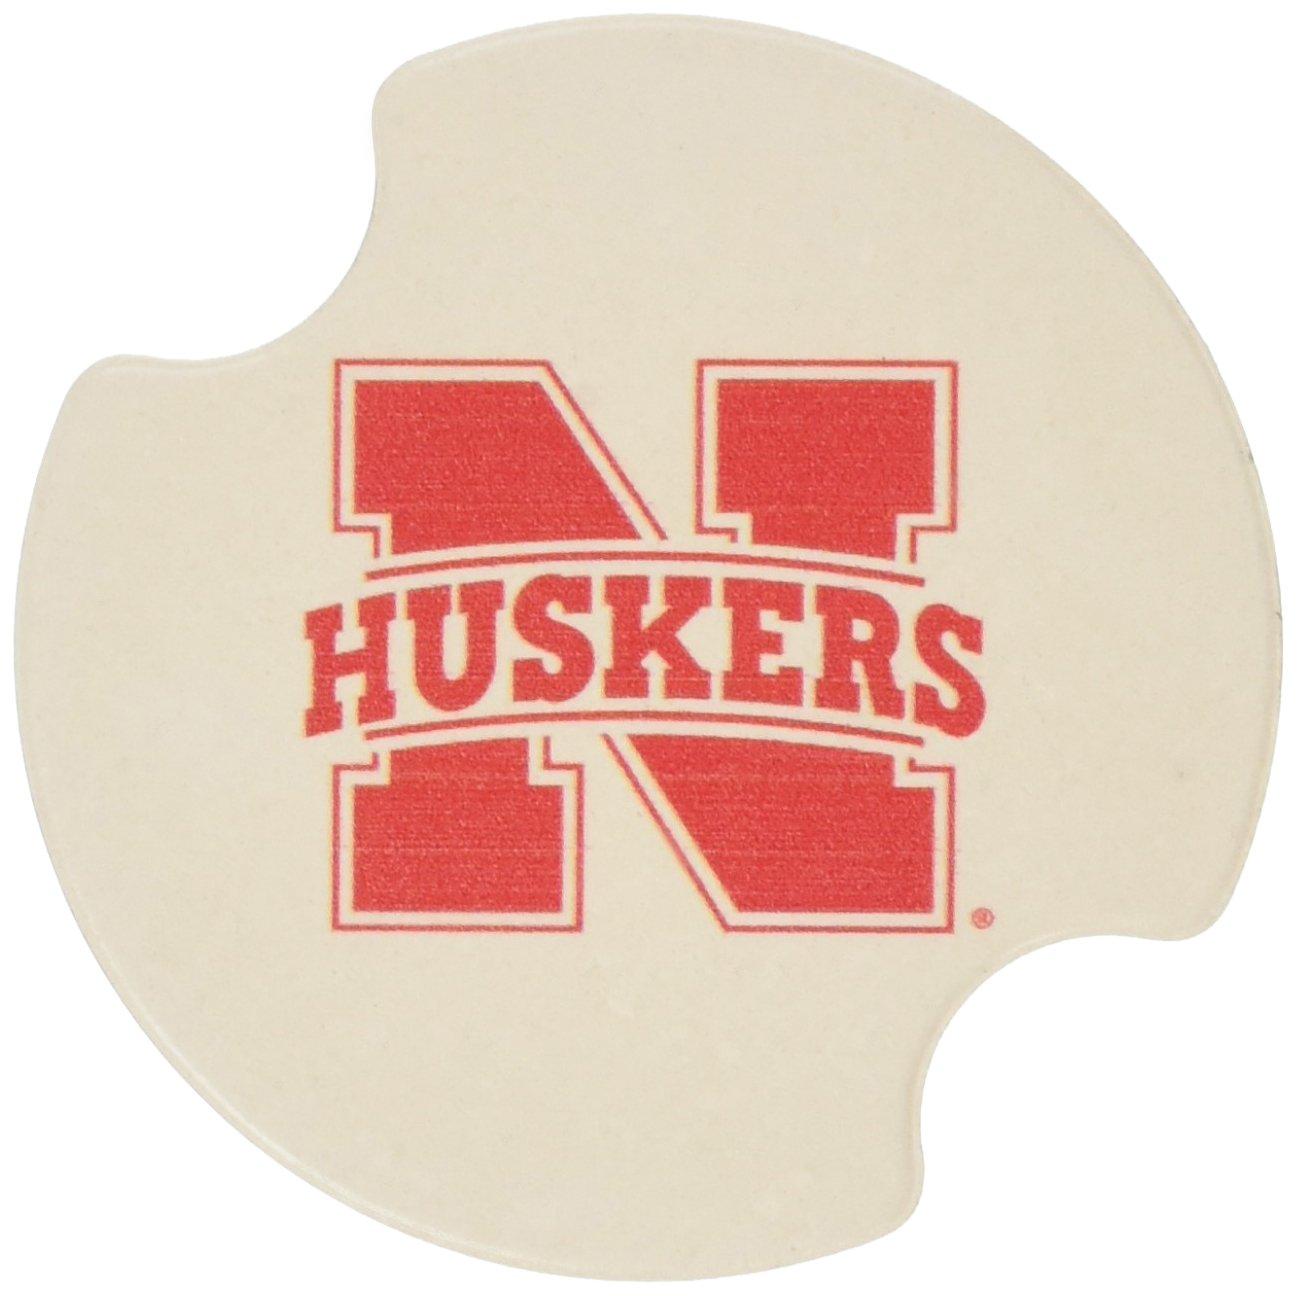 Thirstystone University of Nebraska Car Cup Holder Coaster 2-Pack